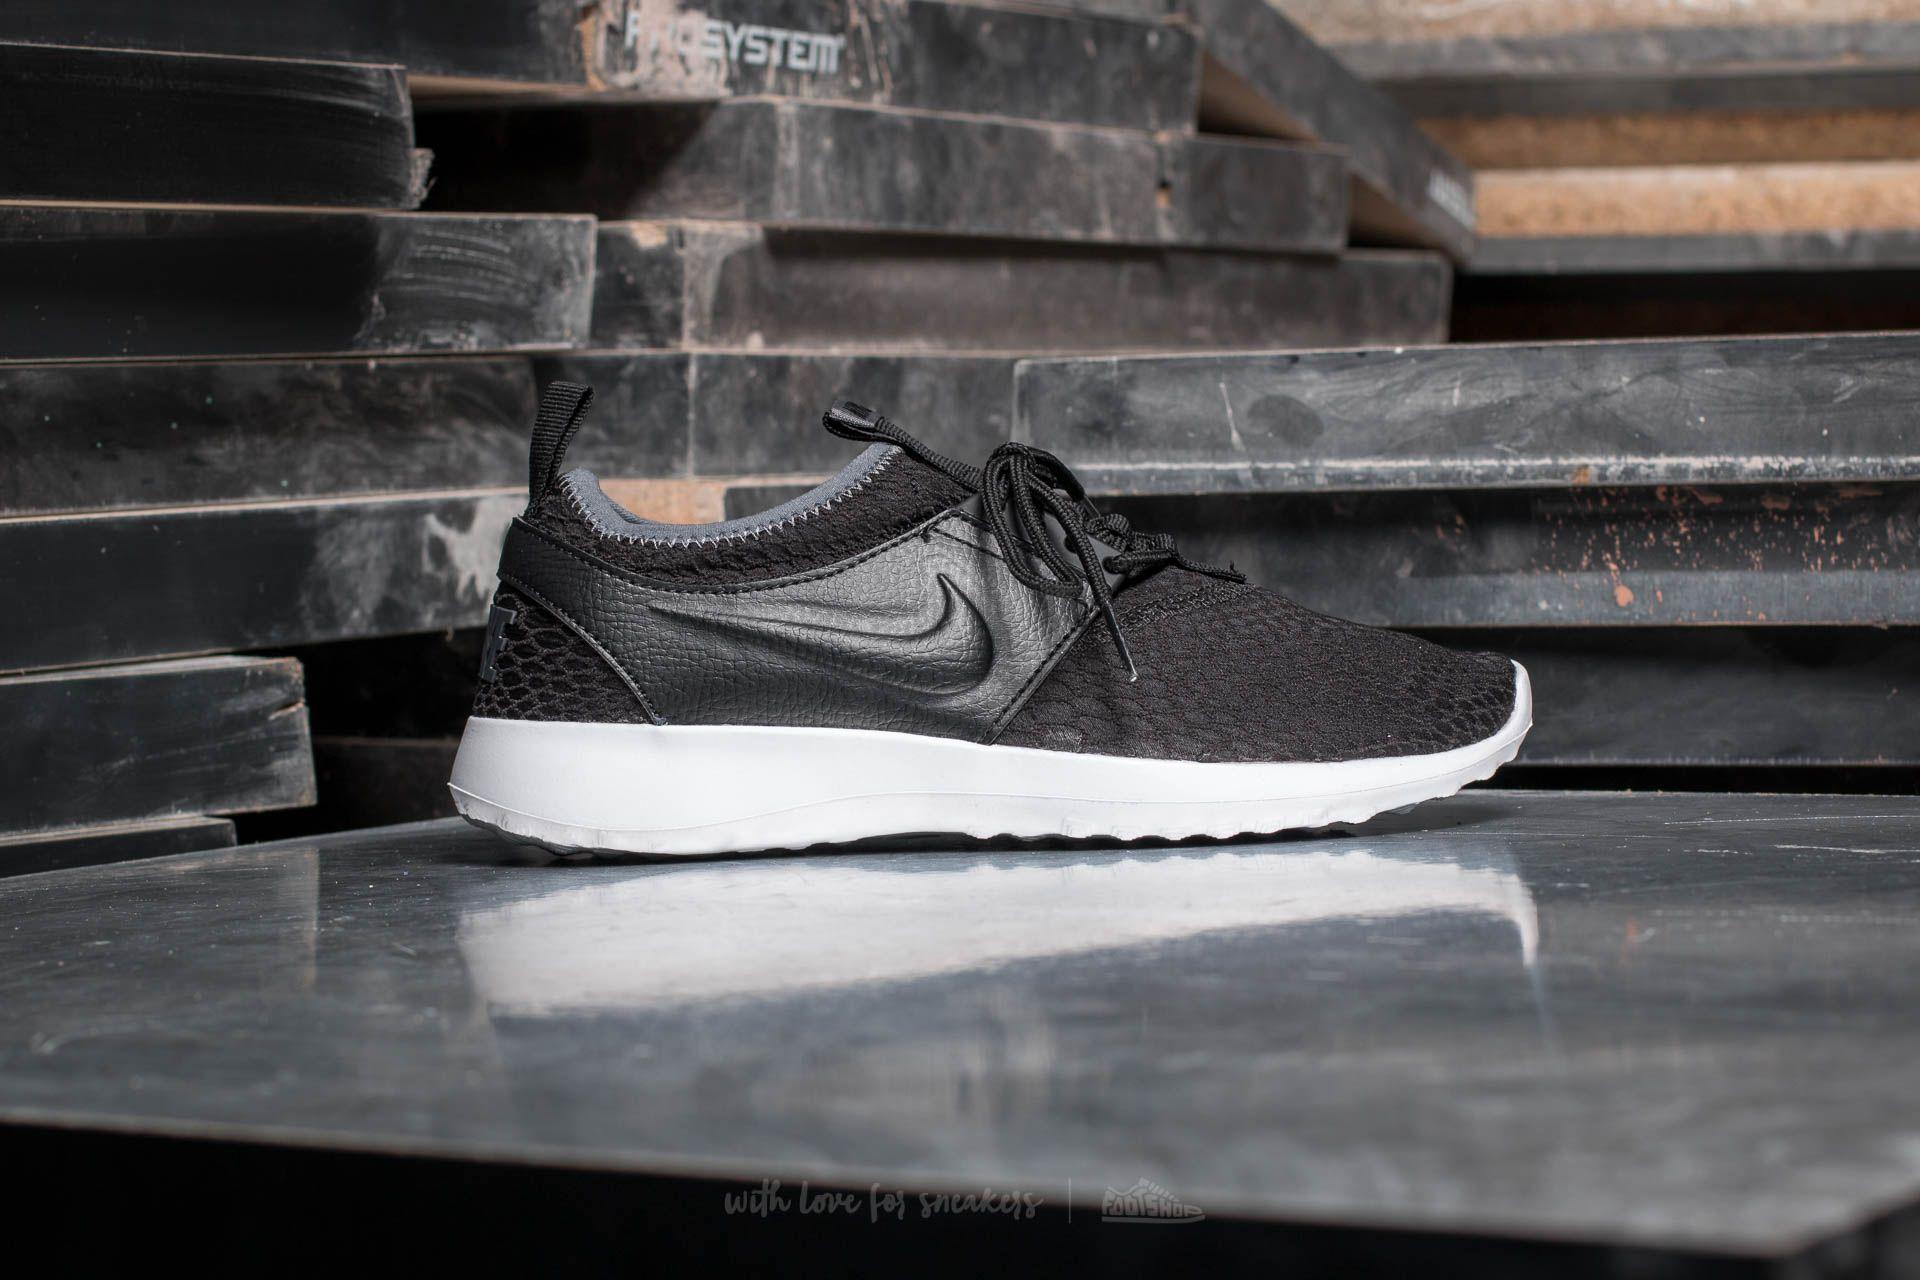 Nike Wmns Juvenate SE BlackBlack Dark Grey White | Footshop